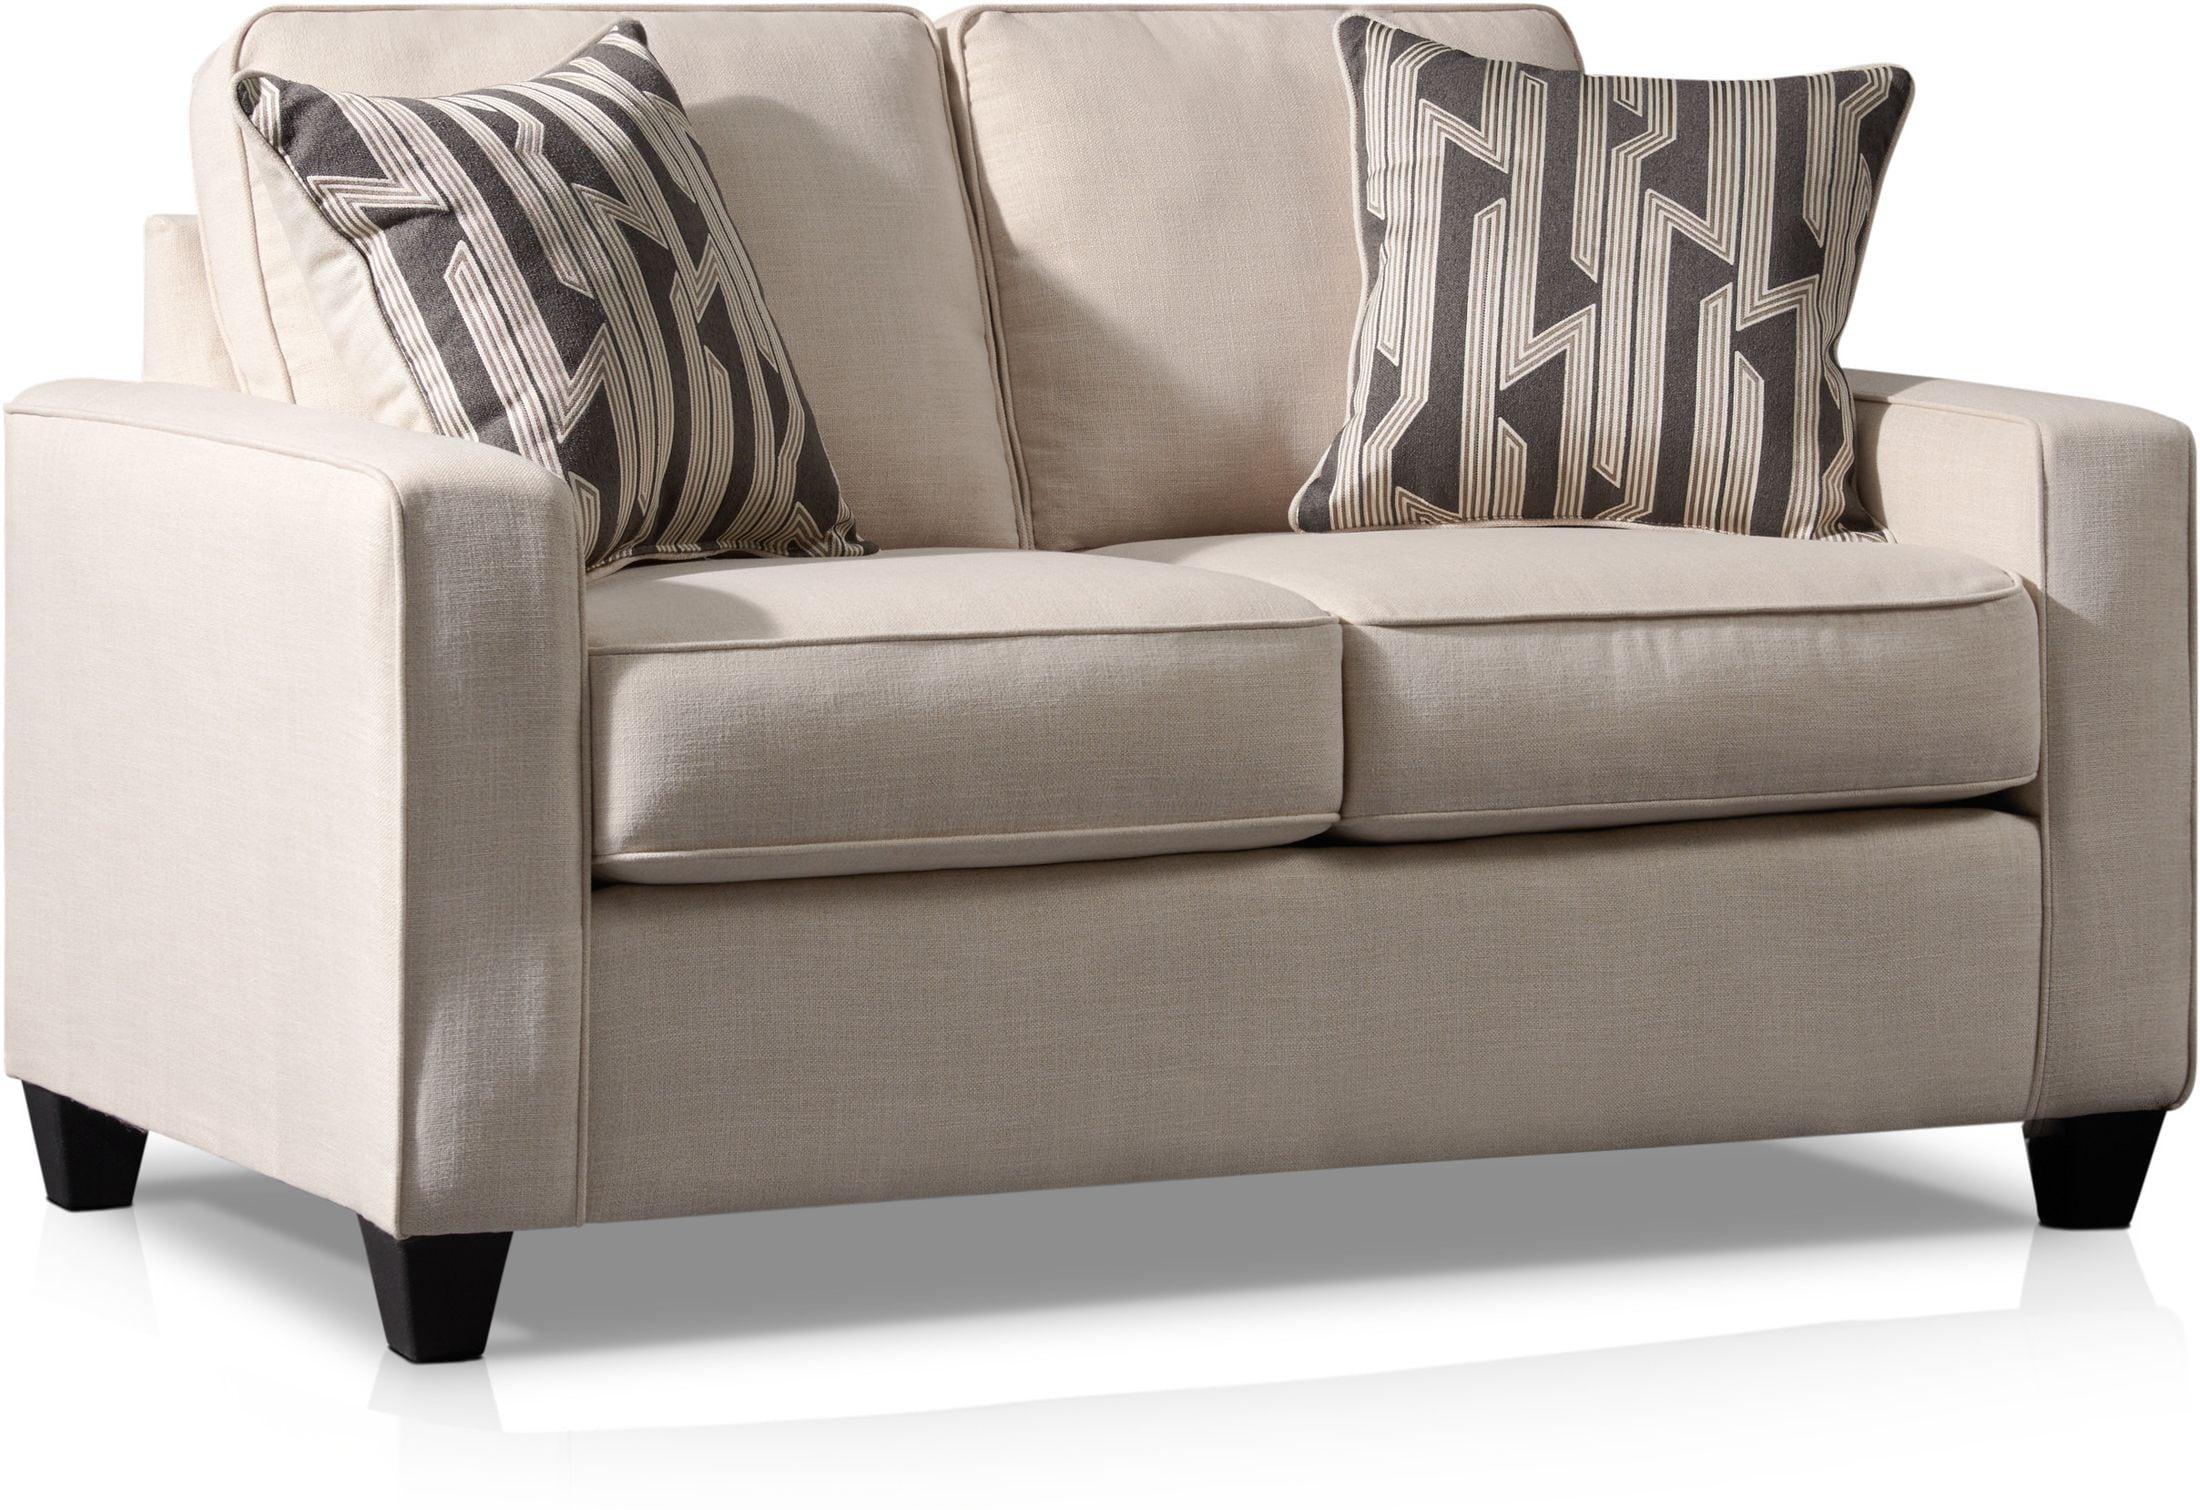 Living Room Furniture - Burton Loveseat